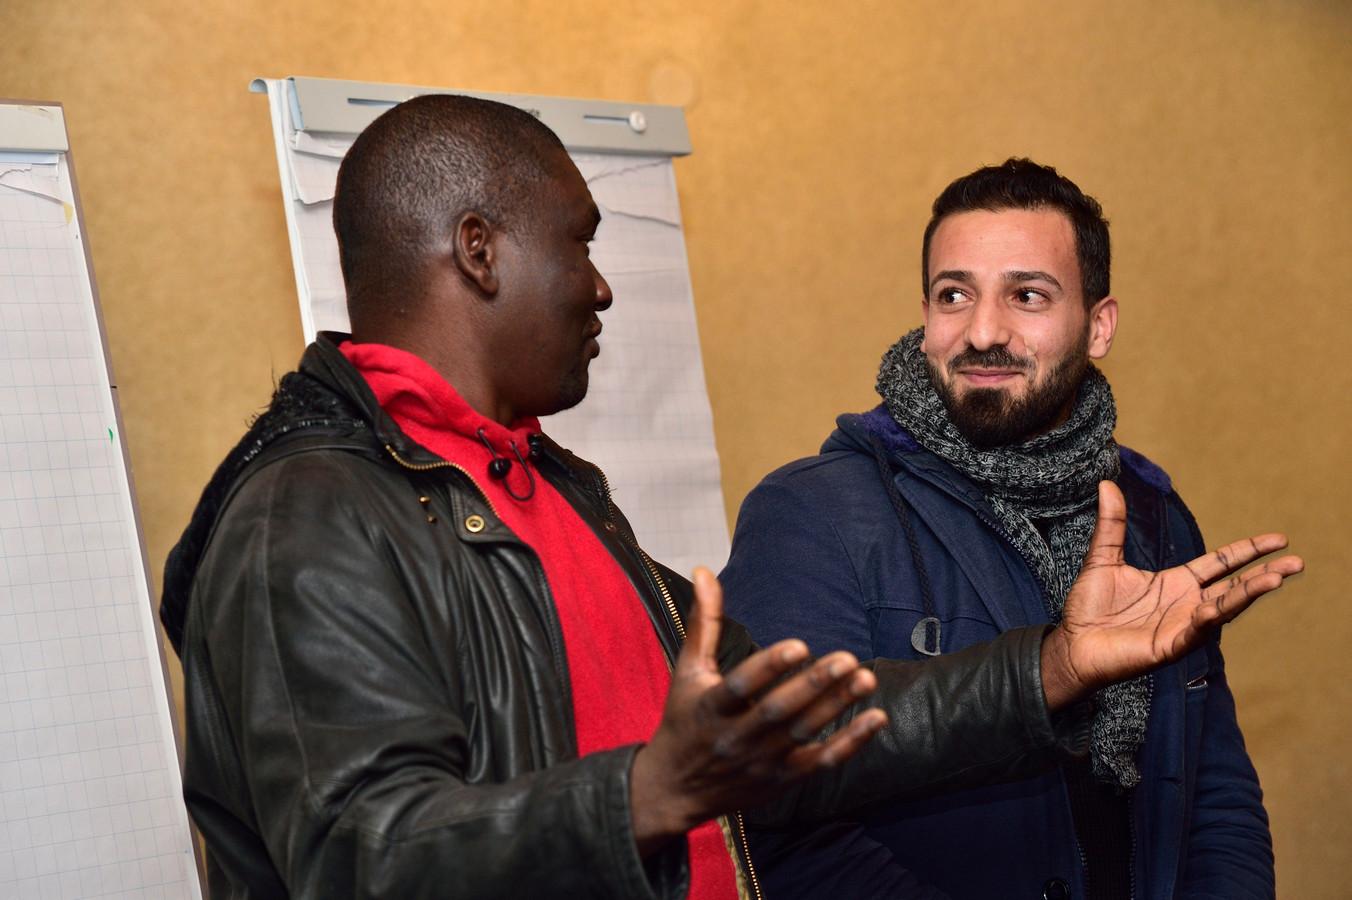 Vluchteling/acteur Fuad Alkhatib met artistiek leider Bright Richards.